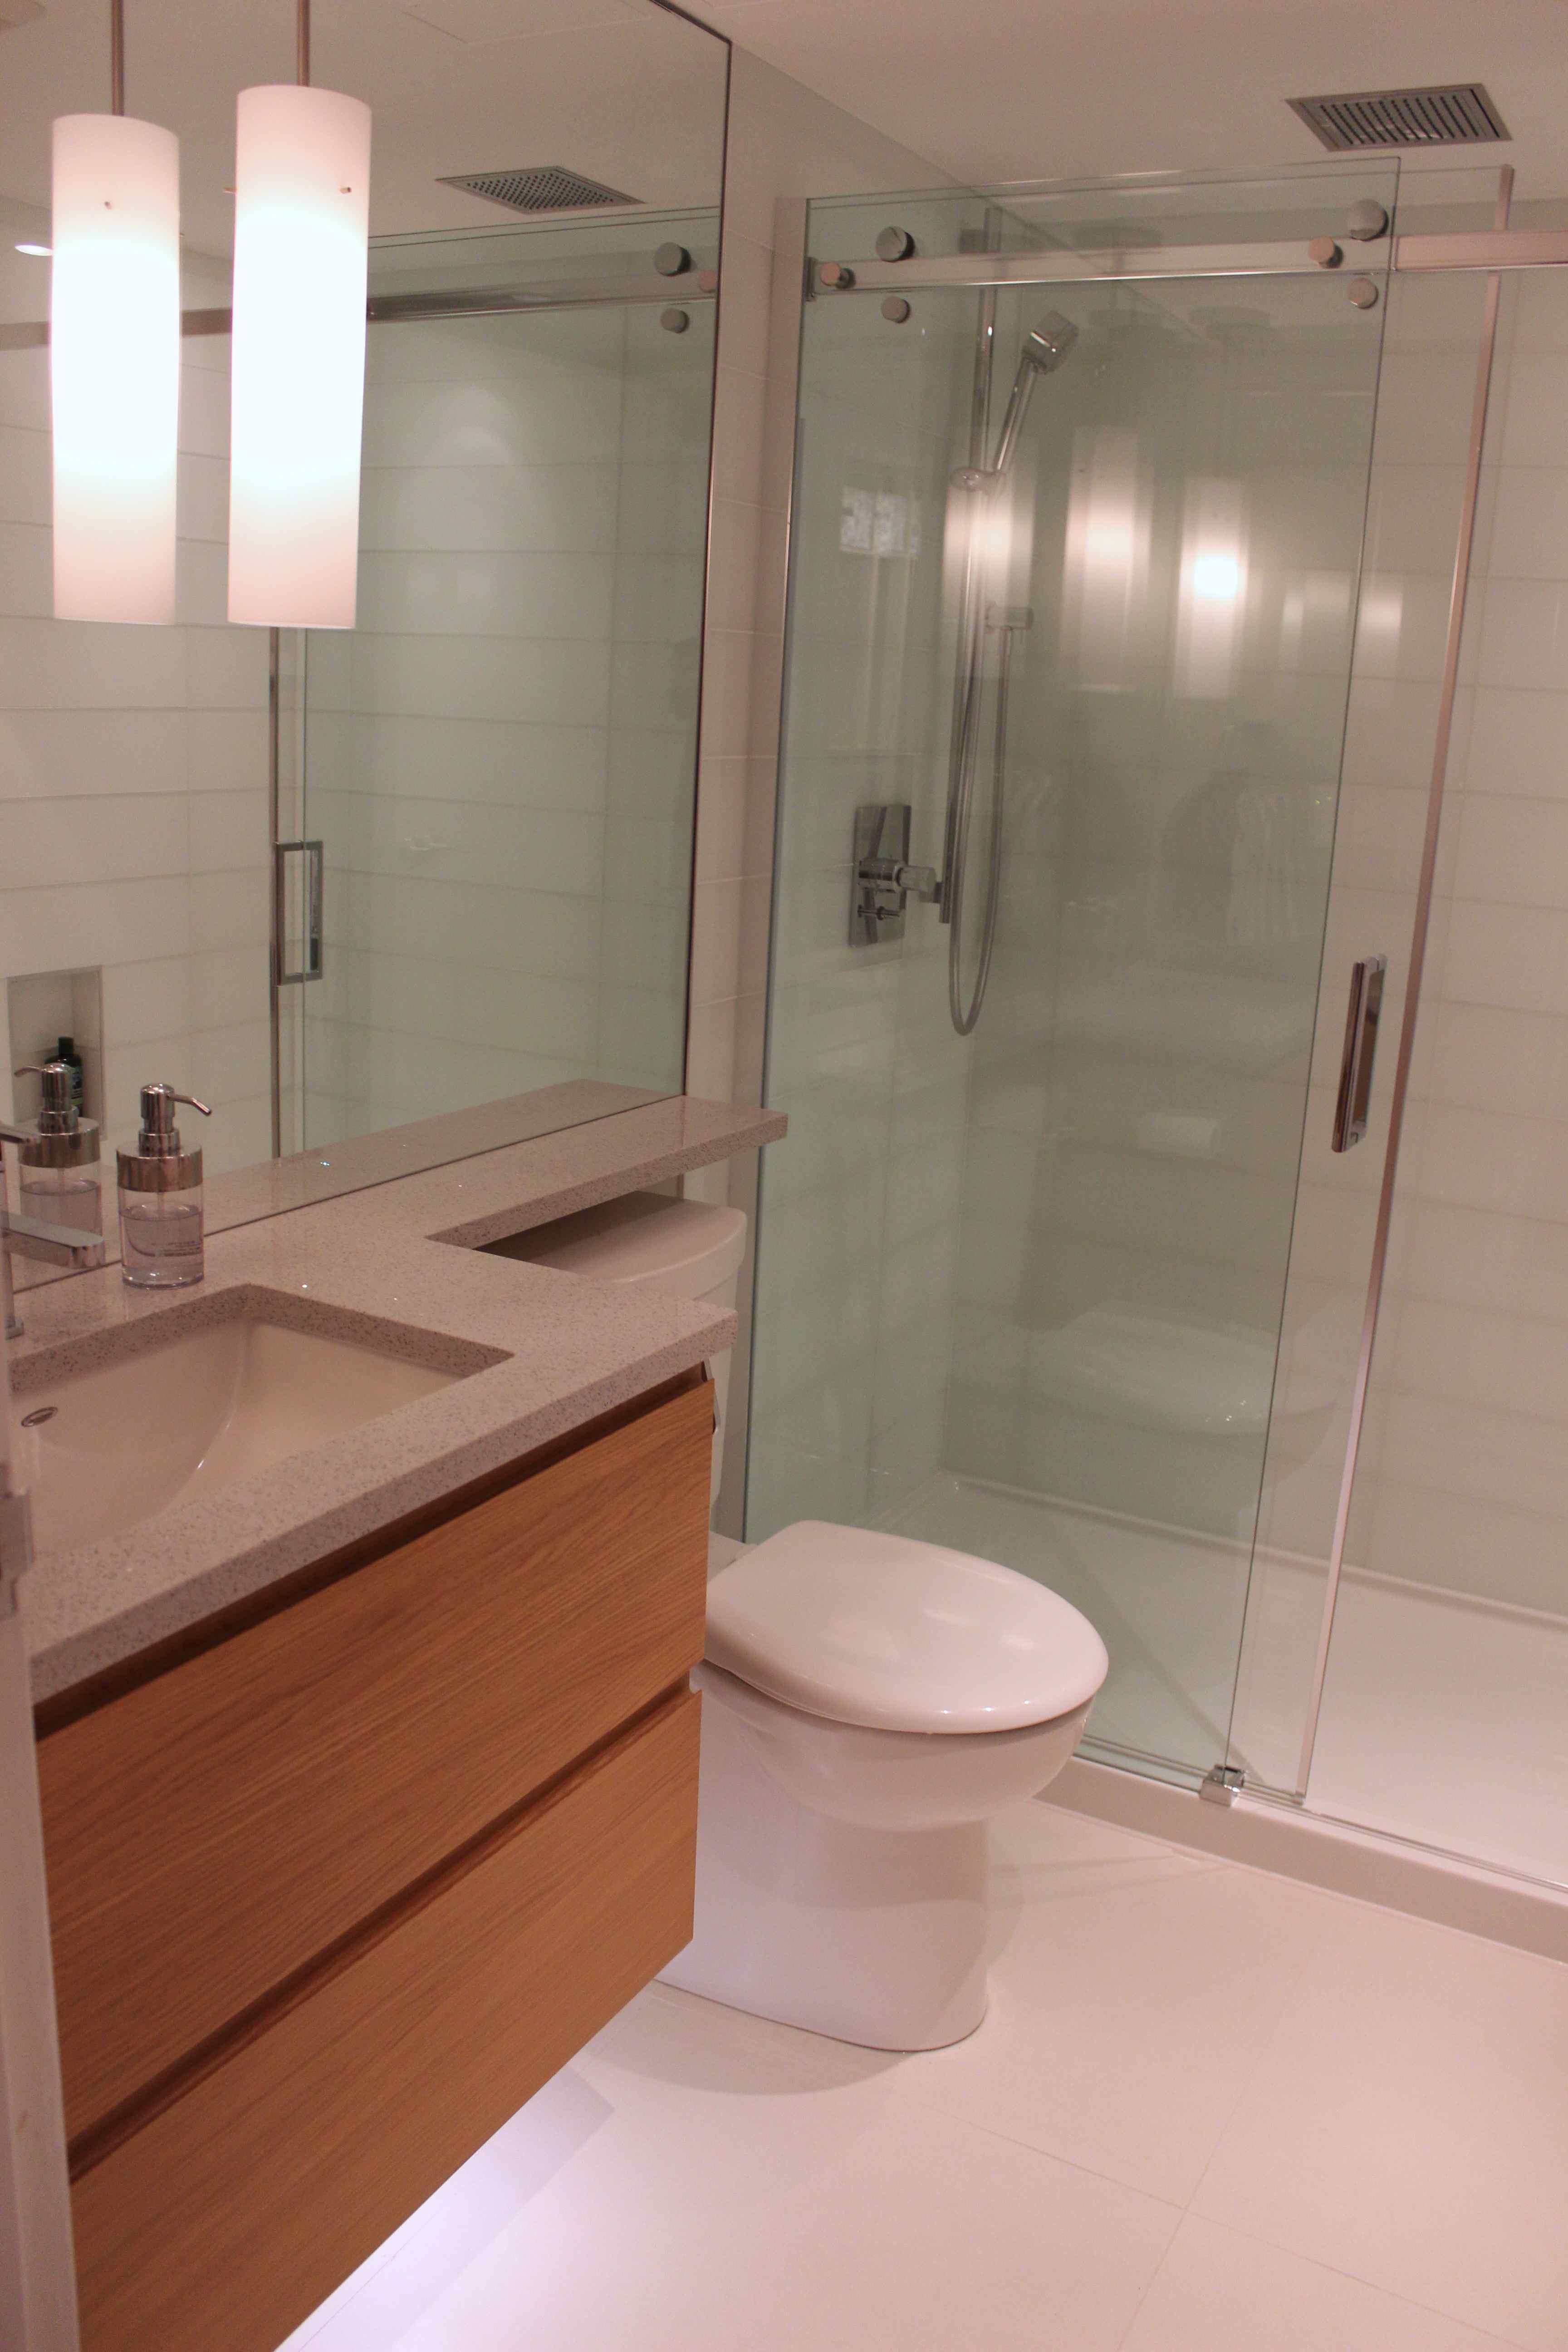 Condo Bathroom Renovation - modern, beautiful and compact